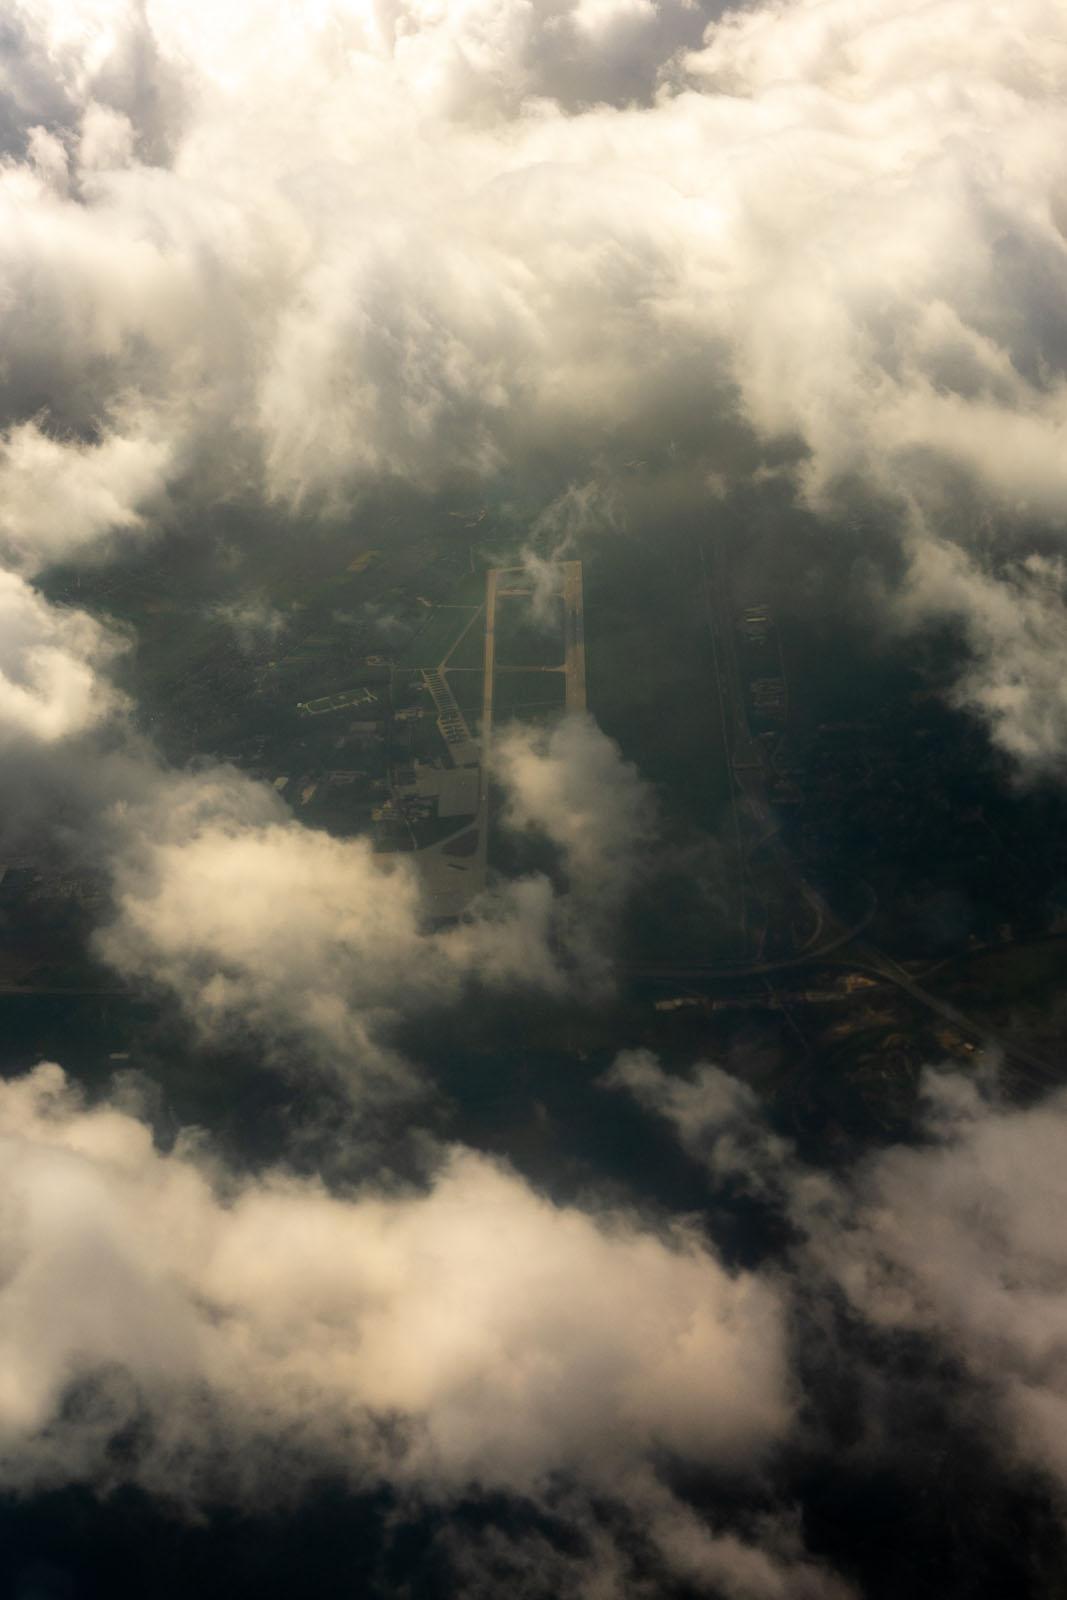 Lotnisko w Balicach z samolotu